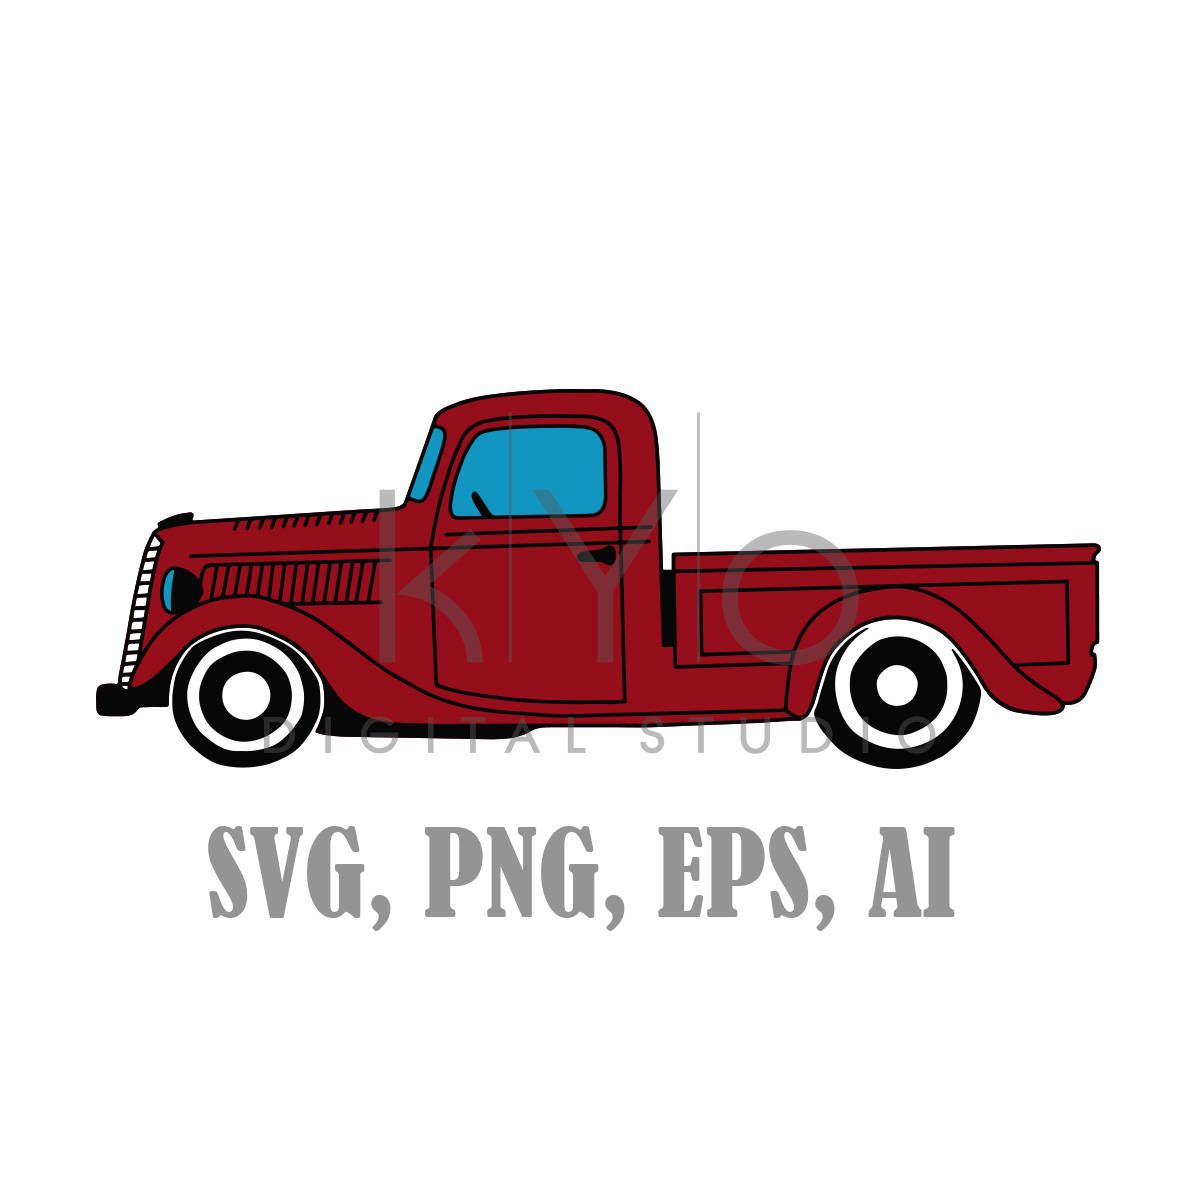 Old Pickup Truck Svg Files 1937 Ford Pickup Truck Svg Files Etsy Old Pickup Trucks Vintage Pickup Trucks Old Pickup